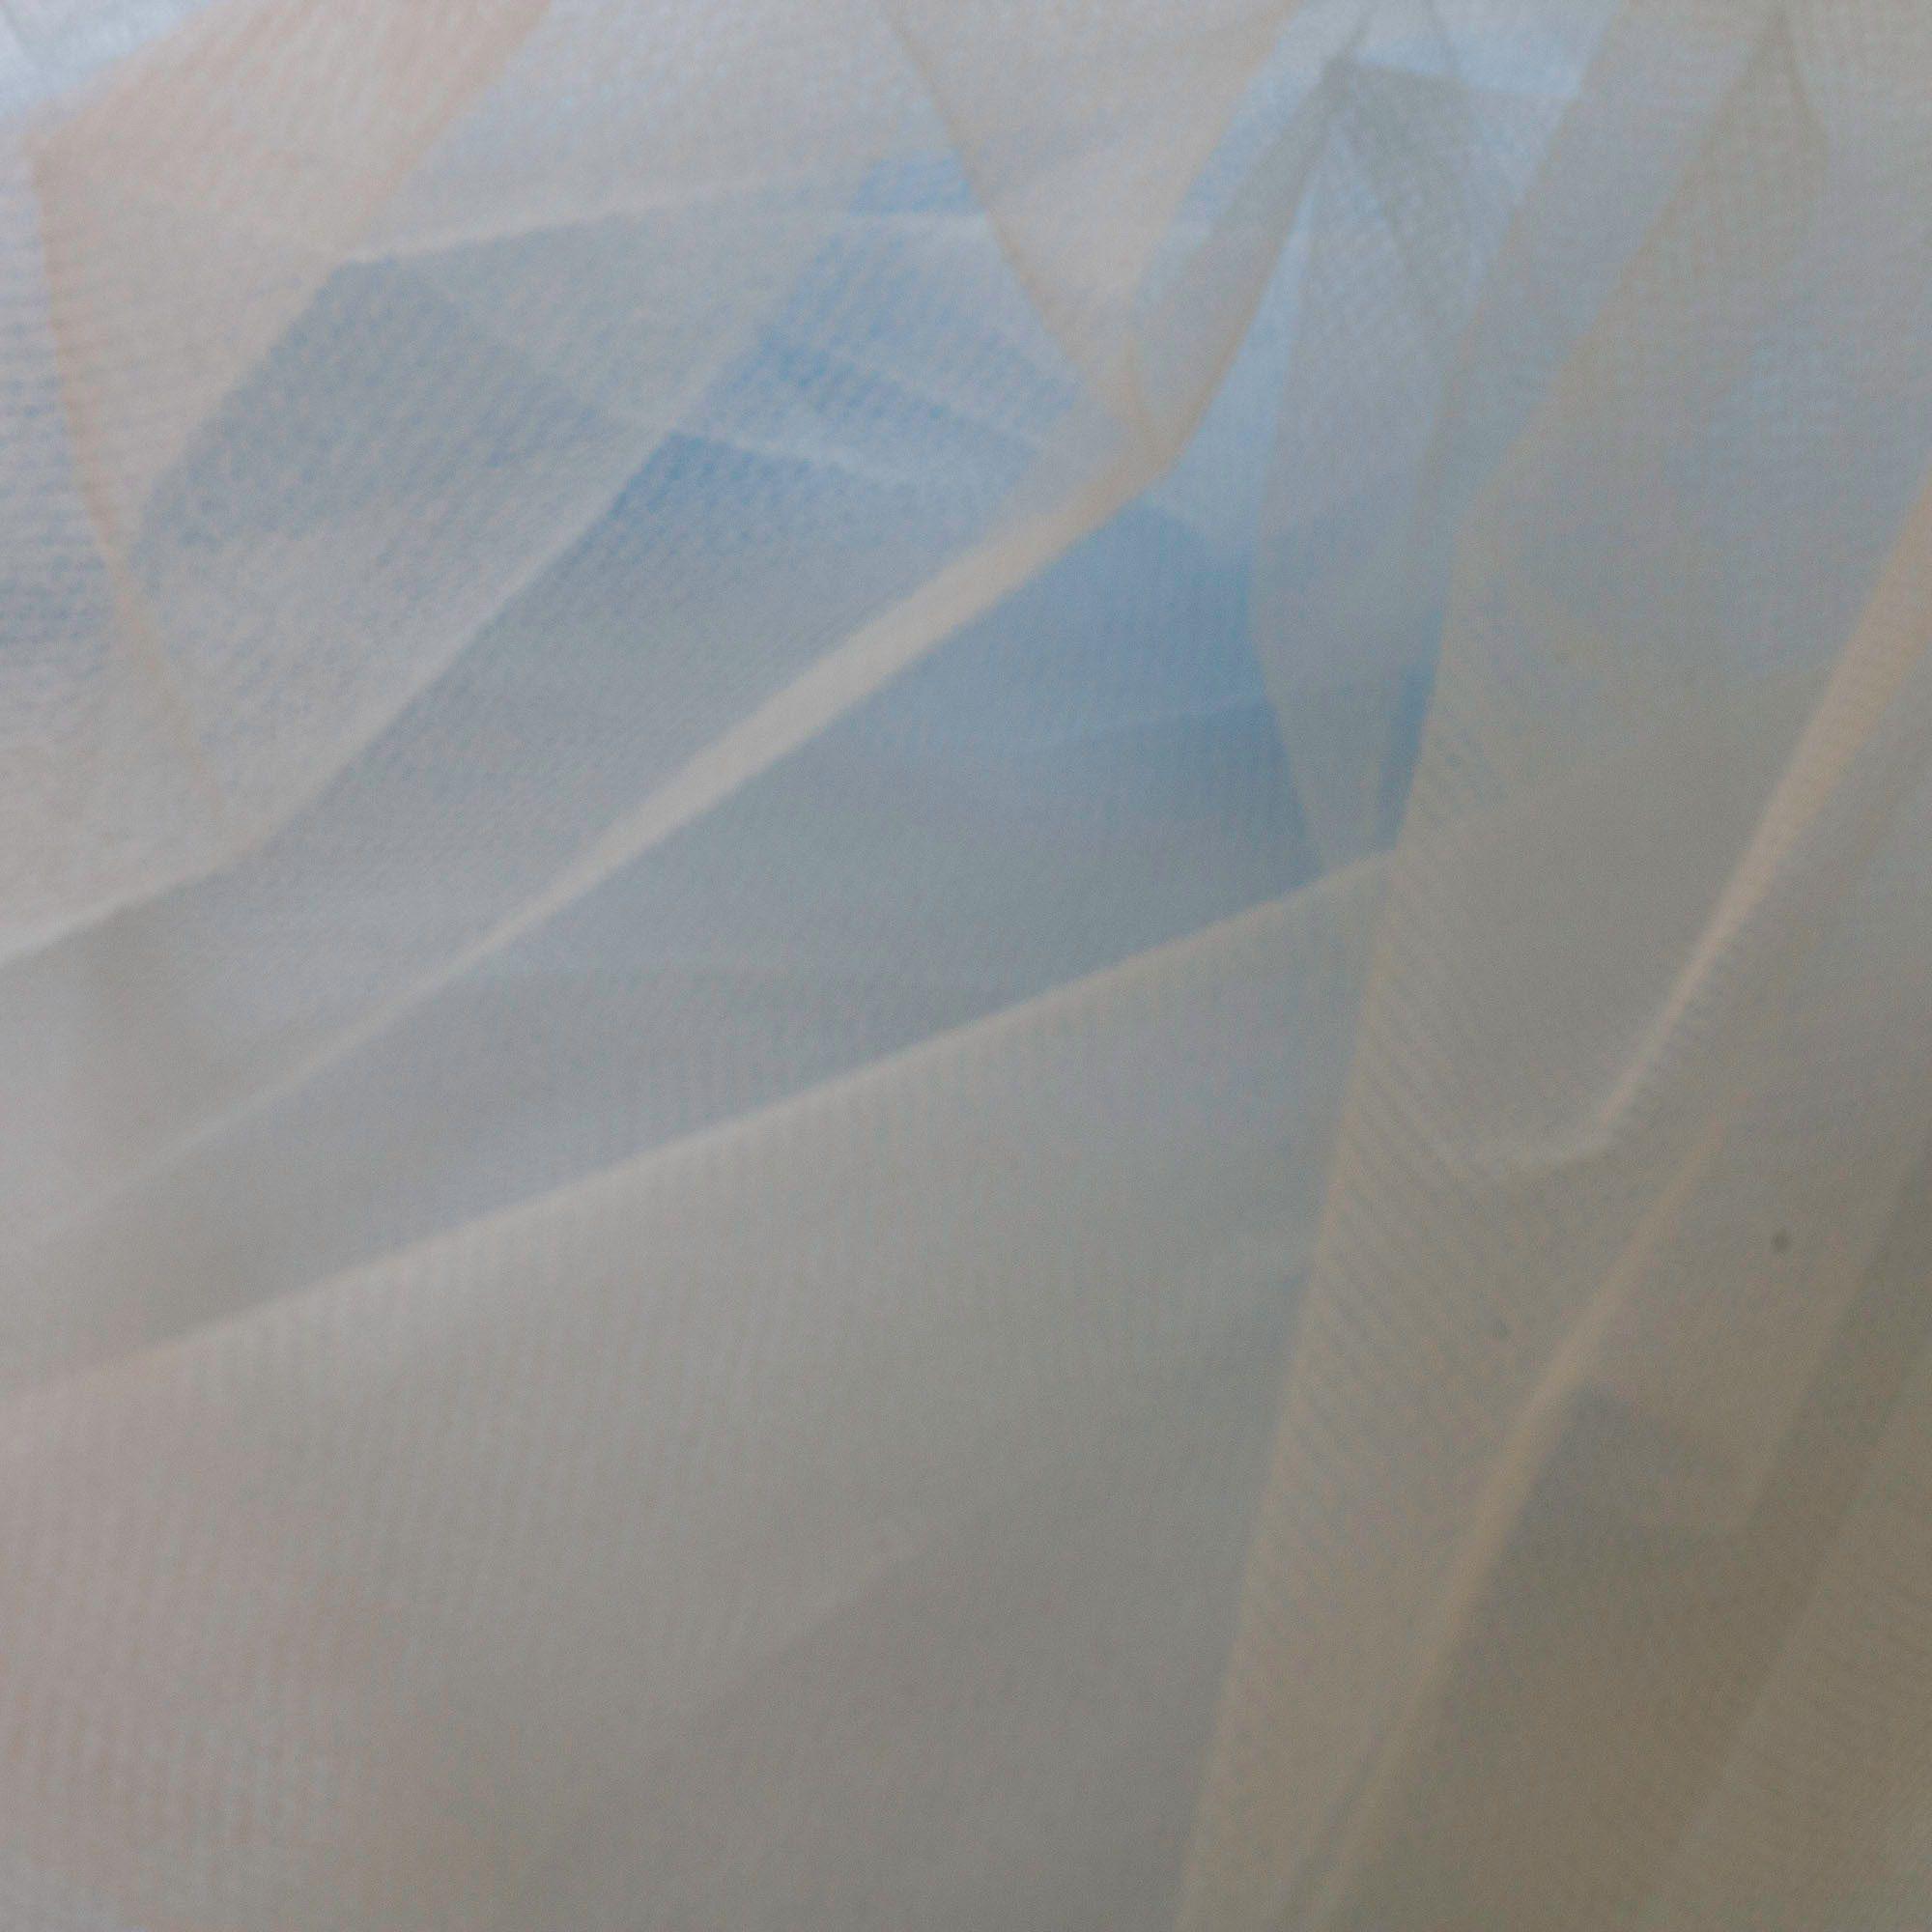 Tecido Filó Azul Claro 100% Poliamida 3 m Largura